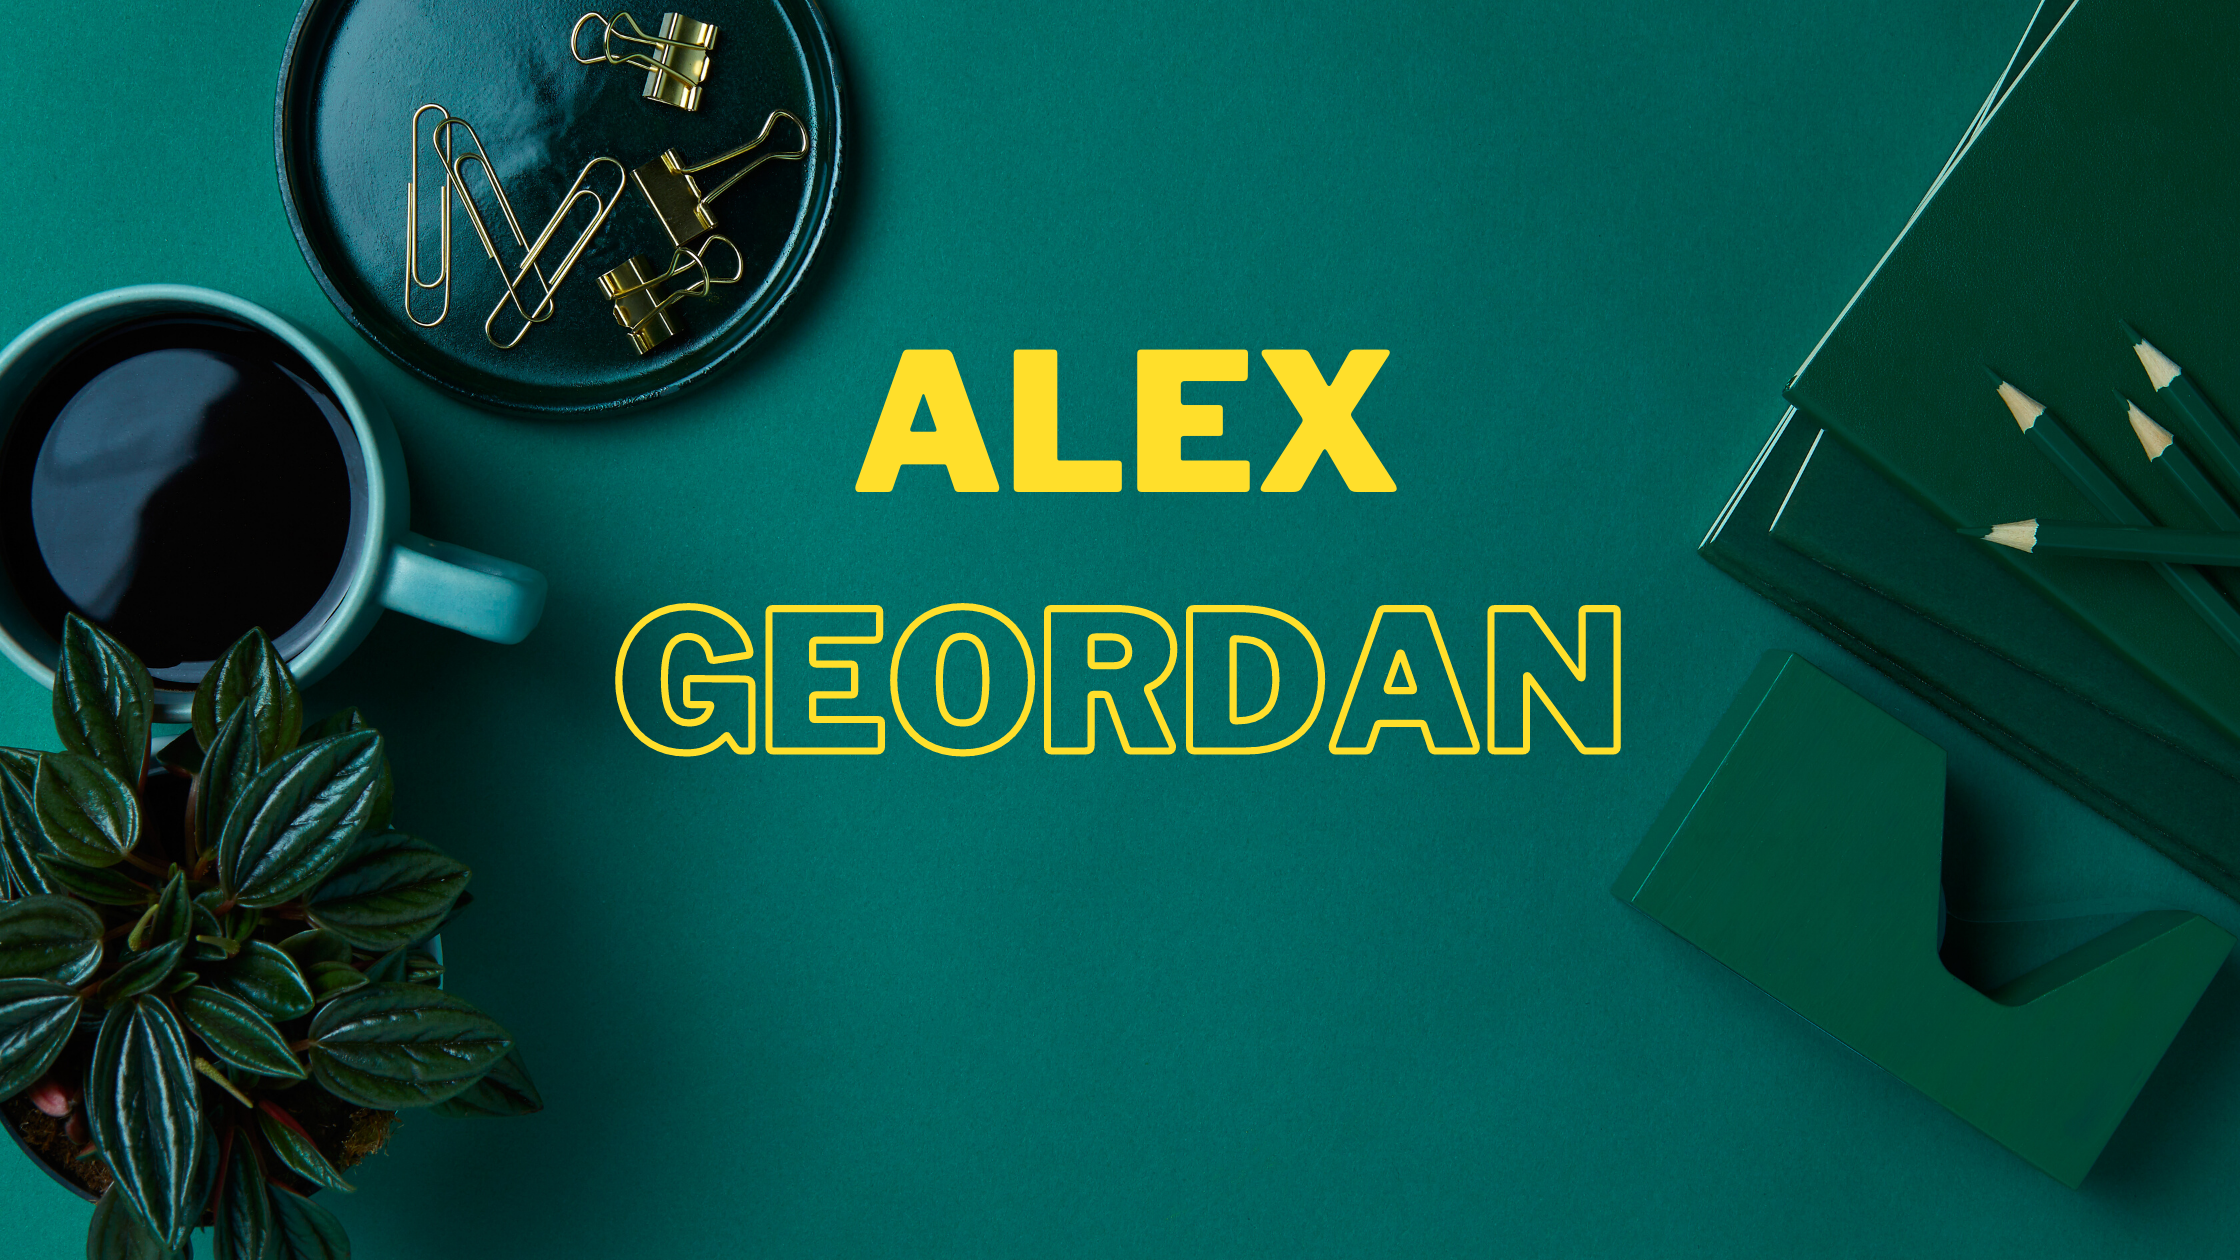 Alex Geordan